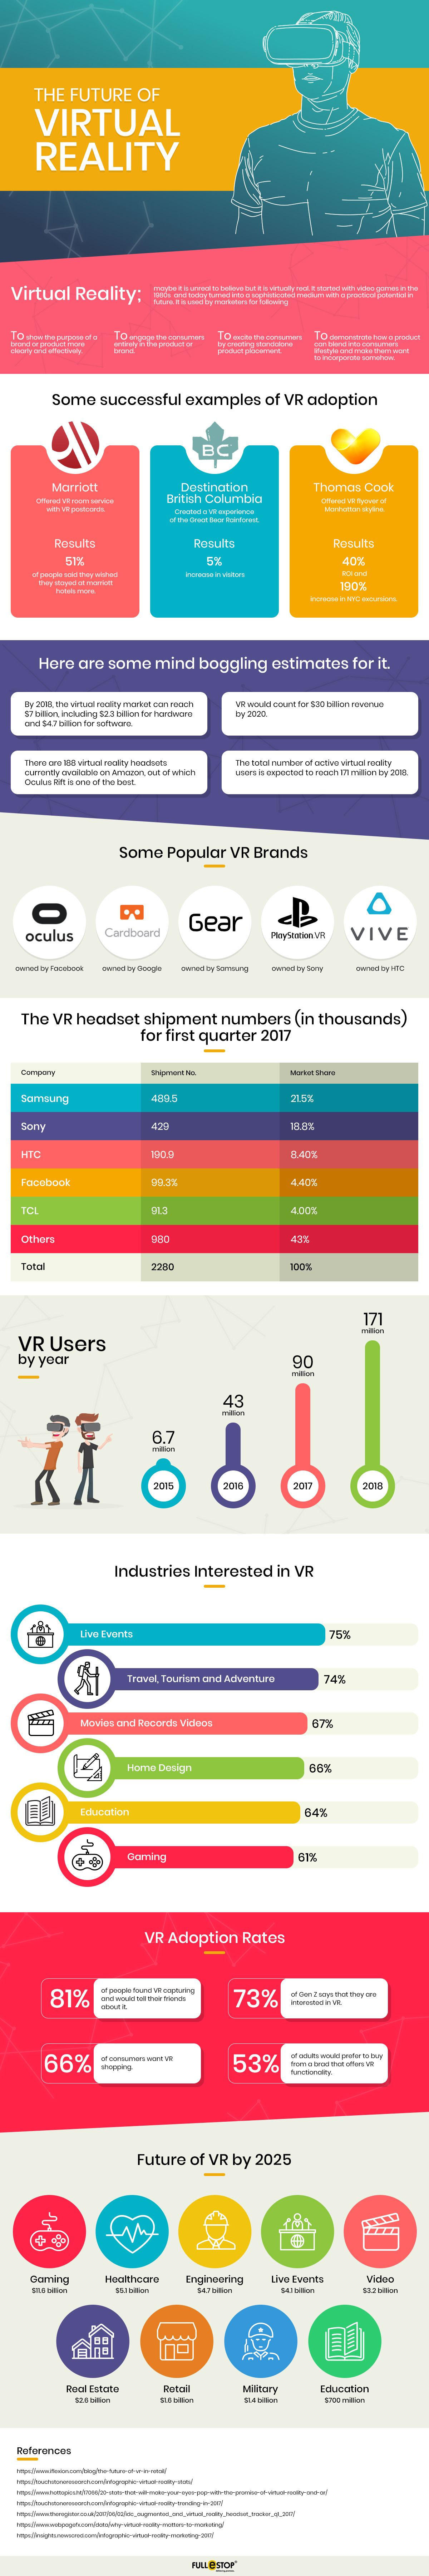 future-of-virtual-reality